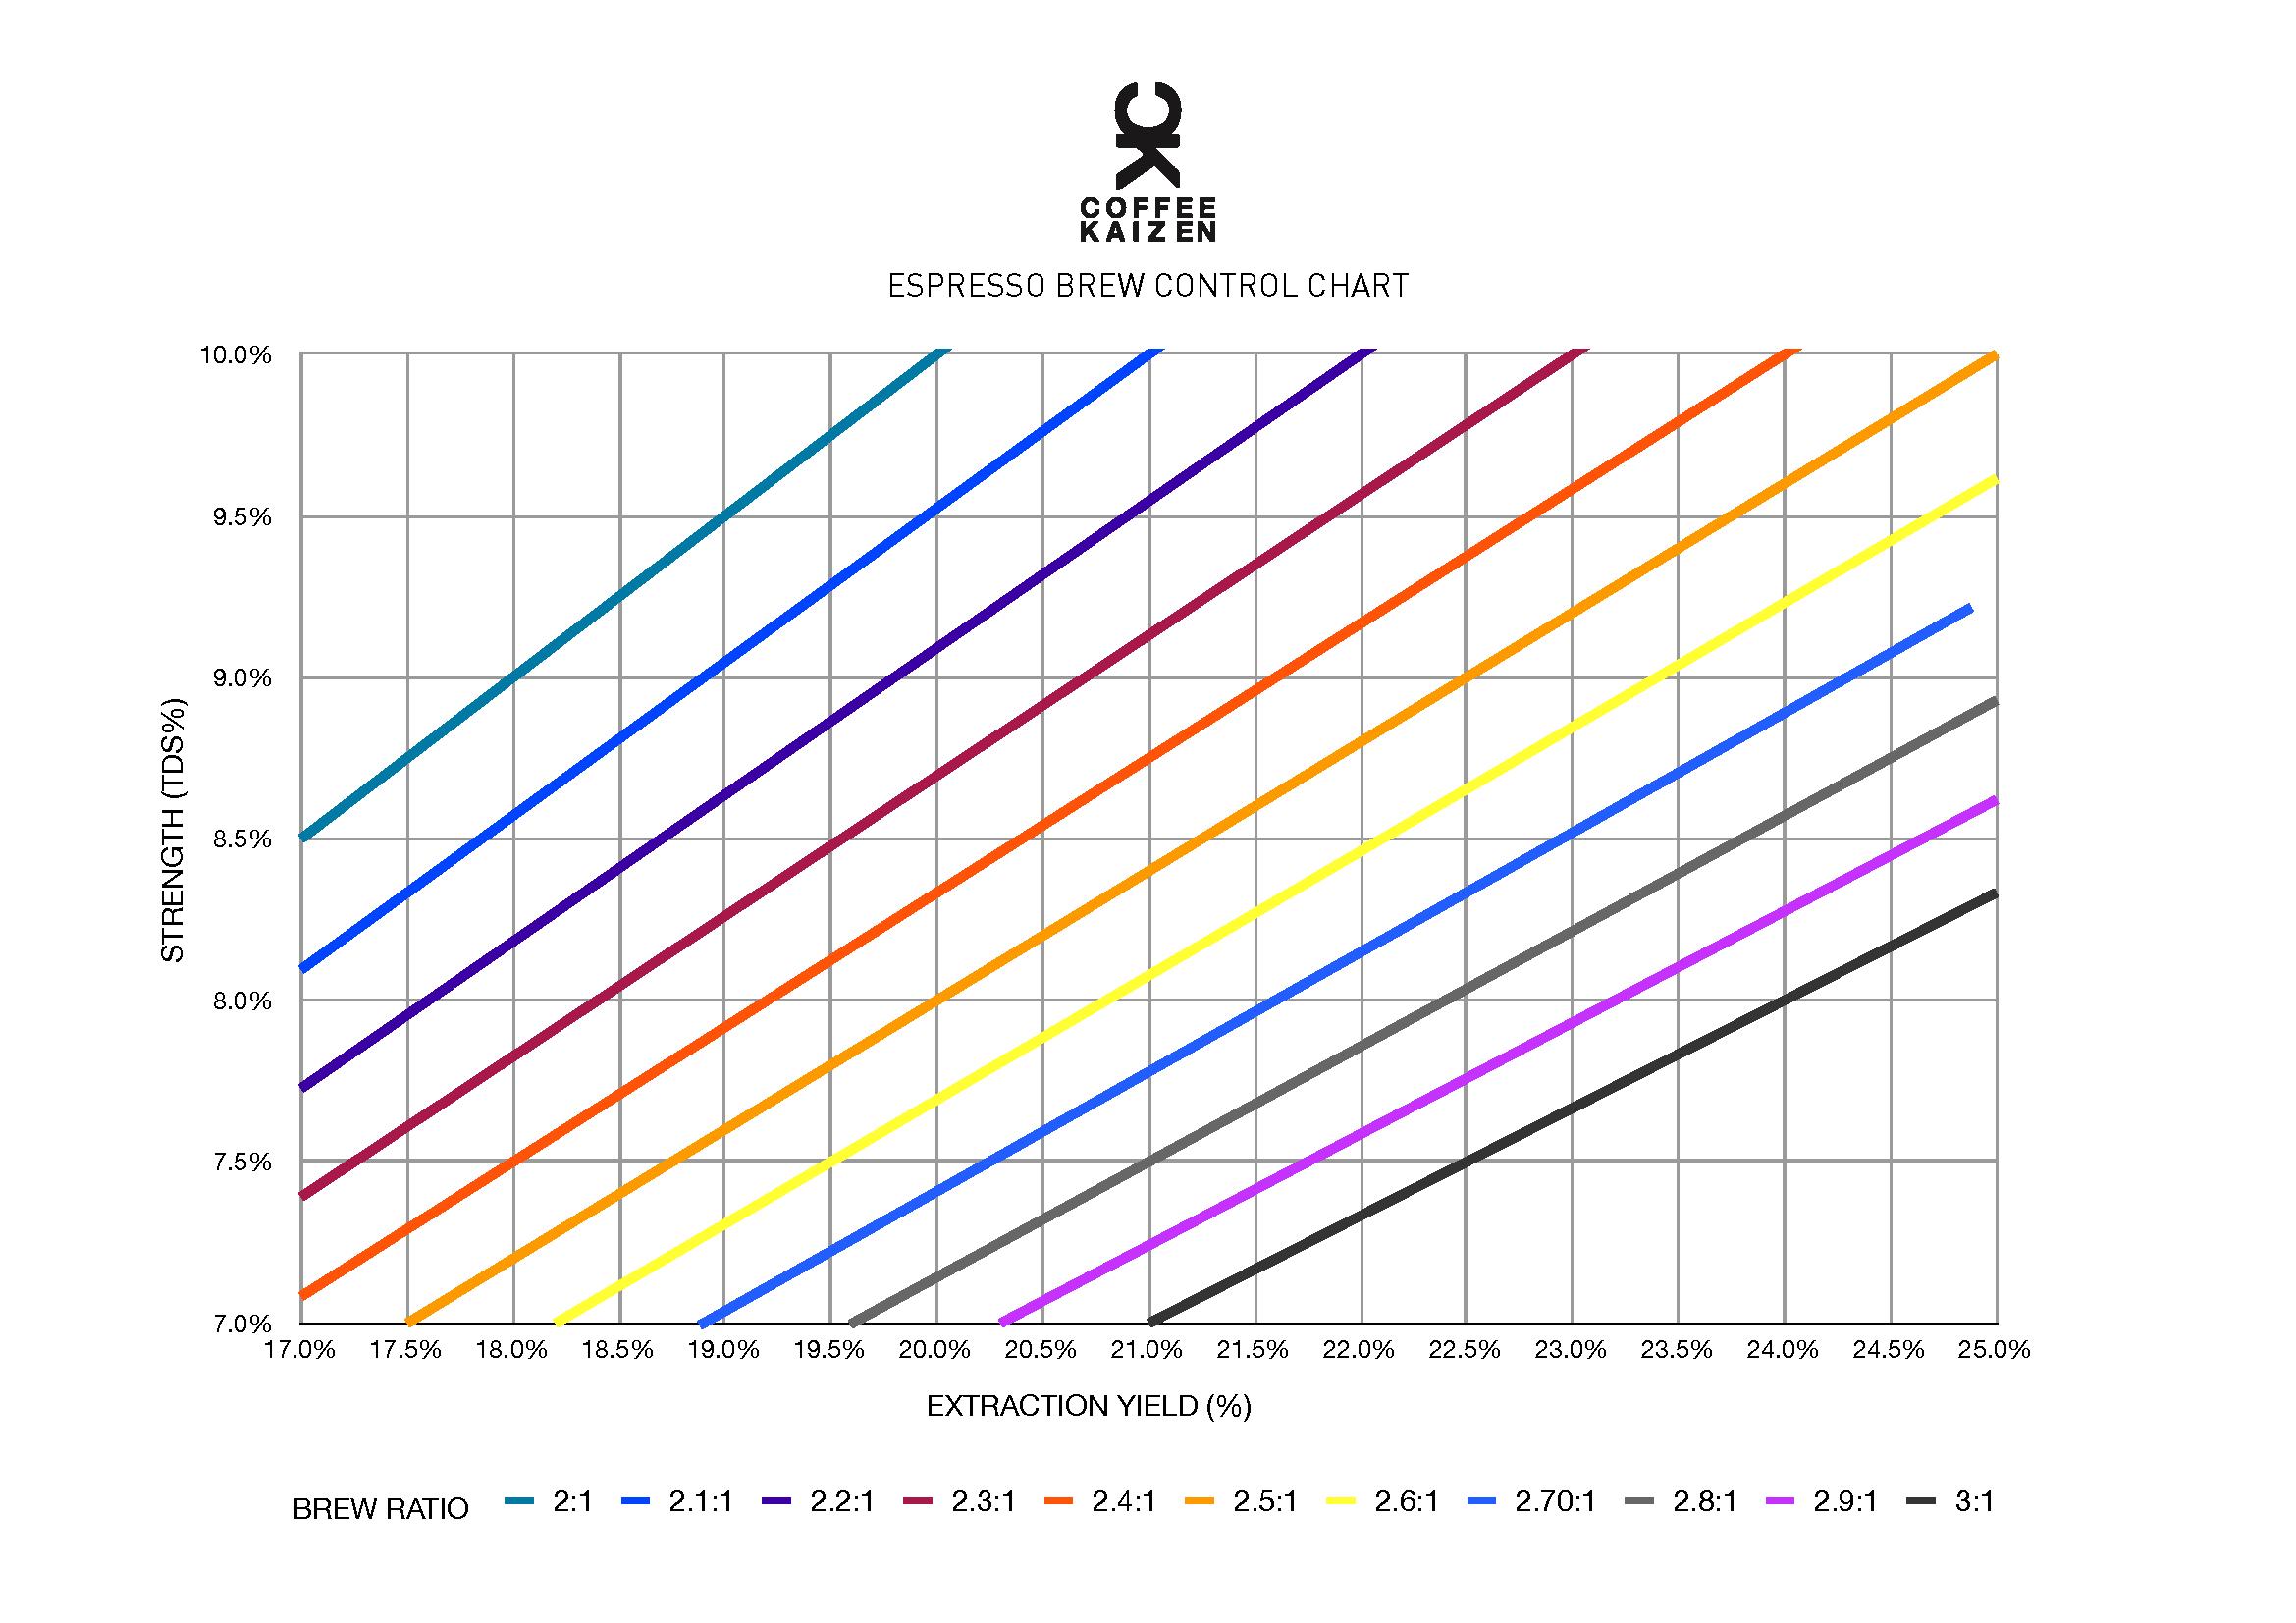 Biểu đồ tỷ lệ pha Espresso Nguồn Sam Sgambellone of Coffee Kaizen